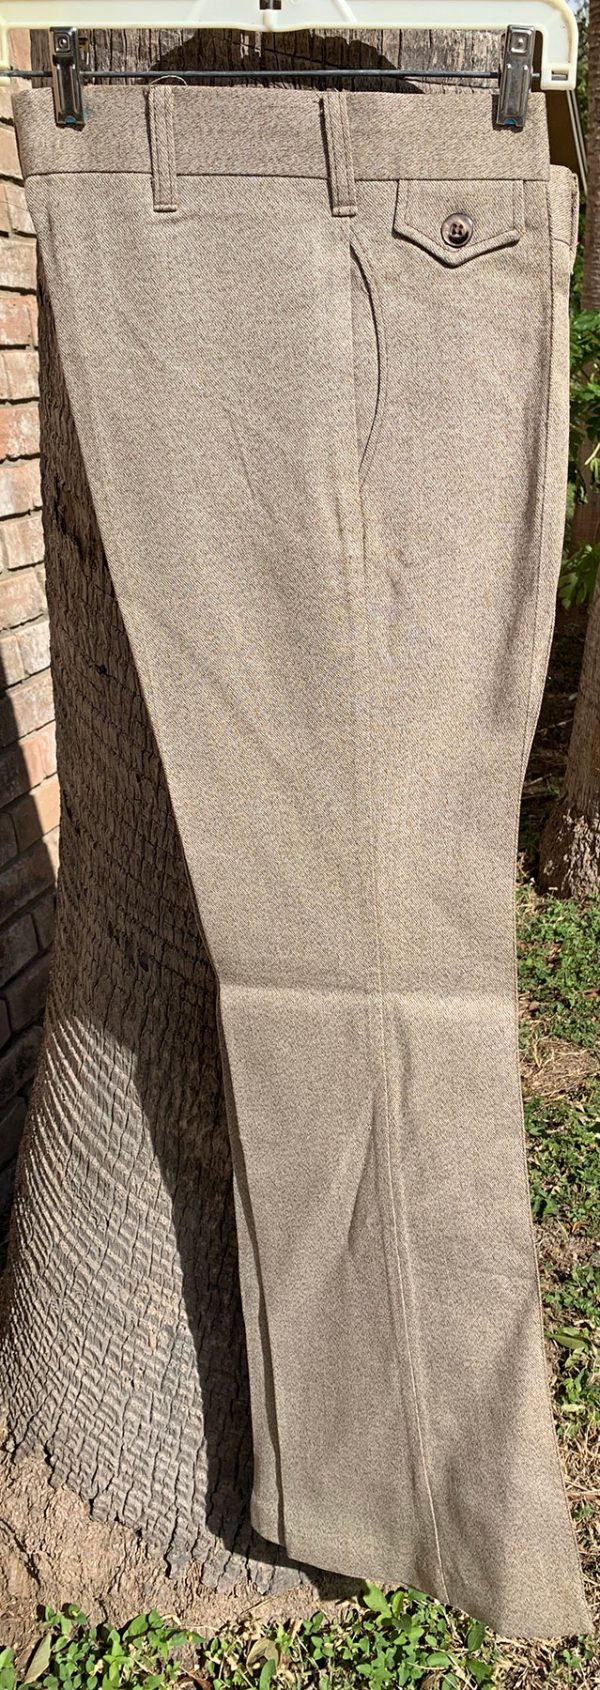 Wrangler Light Brown Tweed 70s Vintage Bell Bottom Pants - 31X32 - 23 Inch Bell